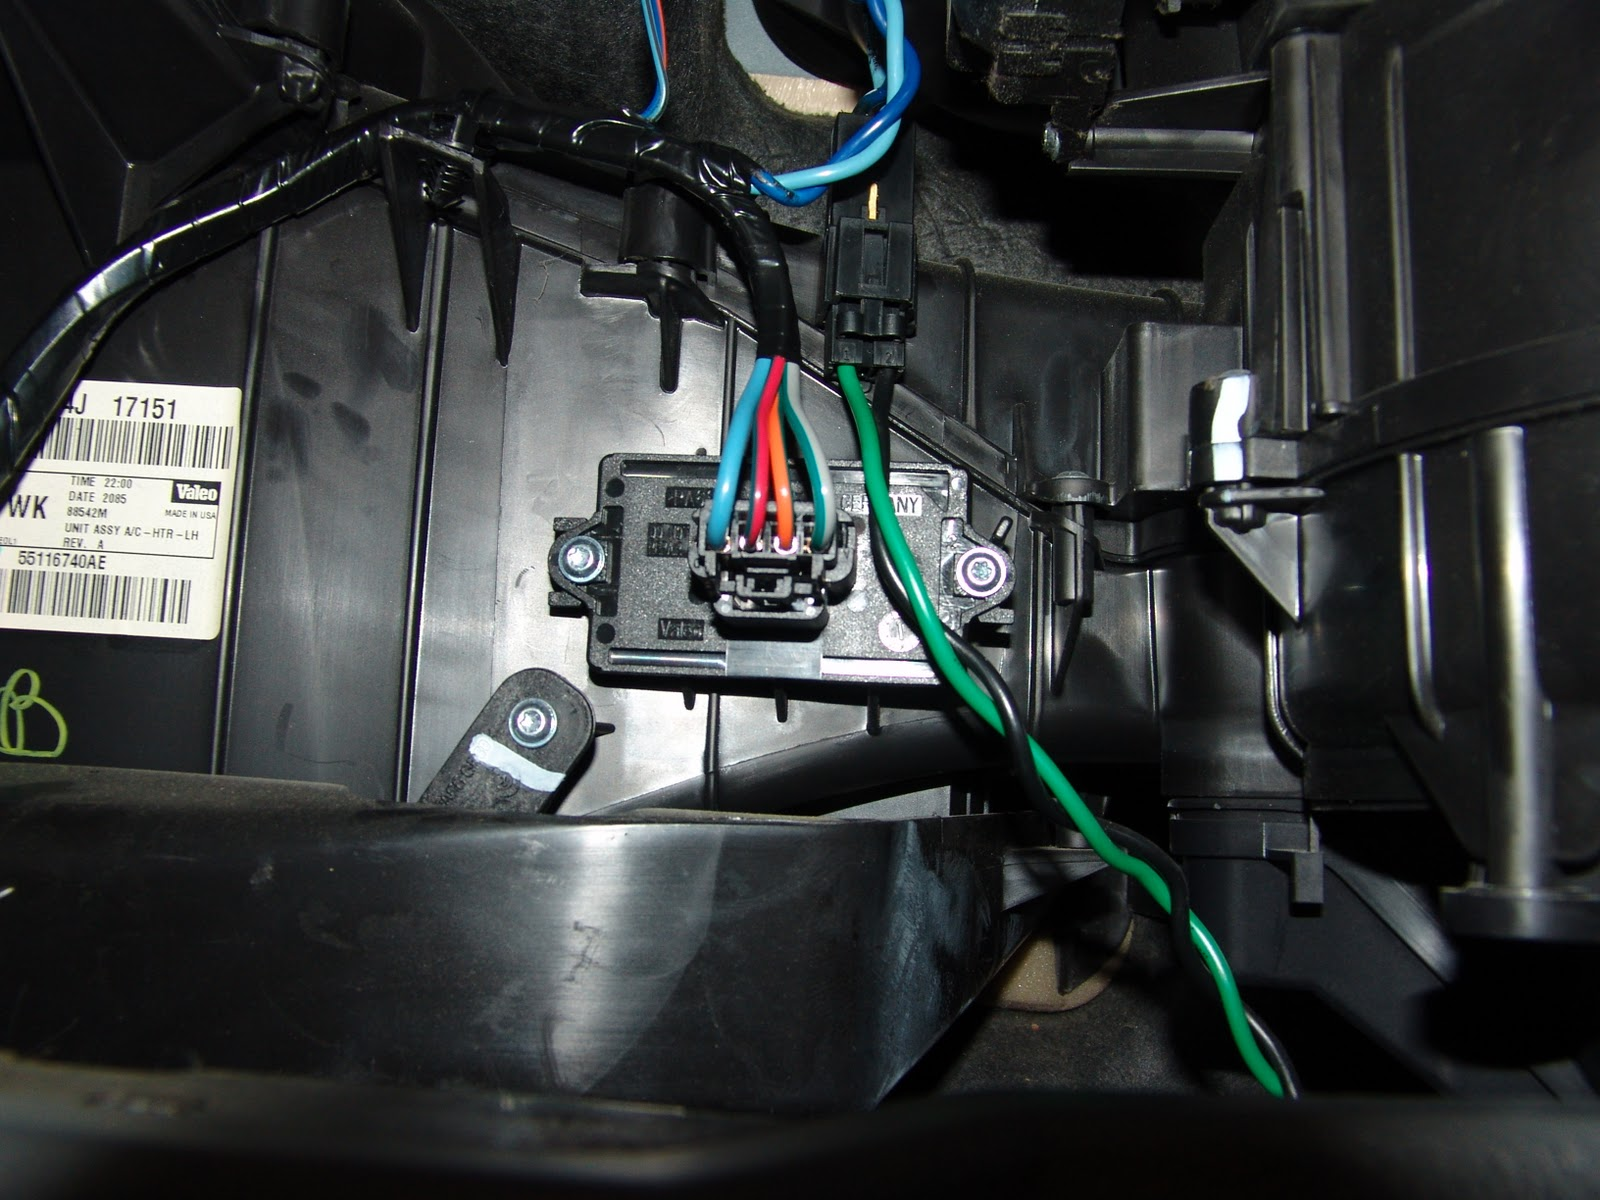 DSC04762 Jeep Blower Motor Resistor Wiring Diagram on jeep wrangler blower motor wiring schematic, 2002 grand cherokee heater diagram, jeep cherokee blower motor, jeep cherokee blower fan relay switch, jeep cj7 blower motor wiring diagram,